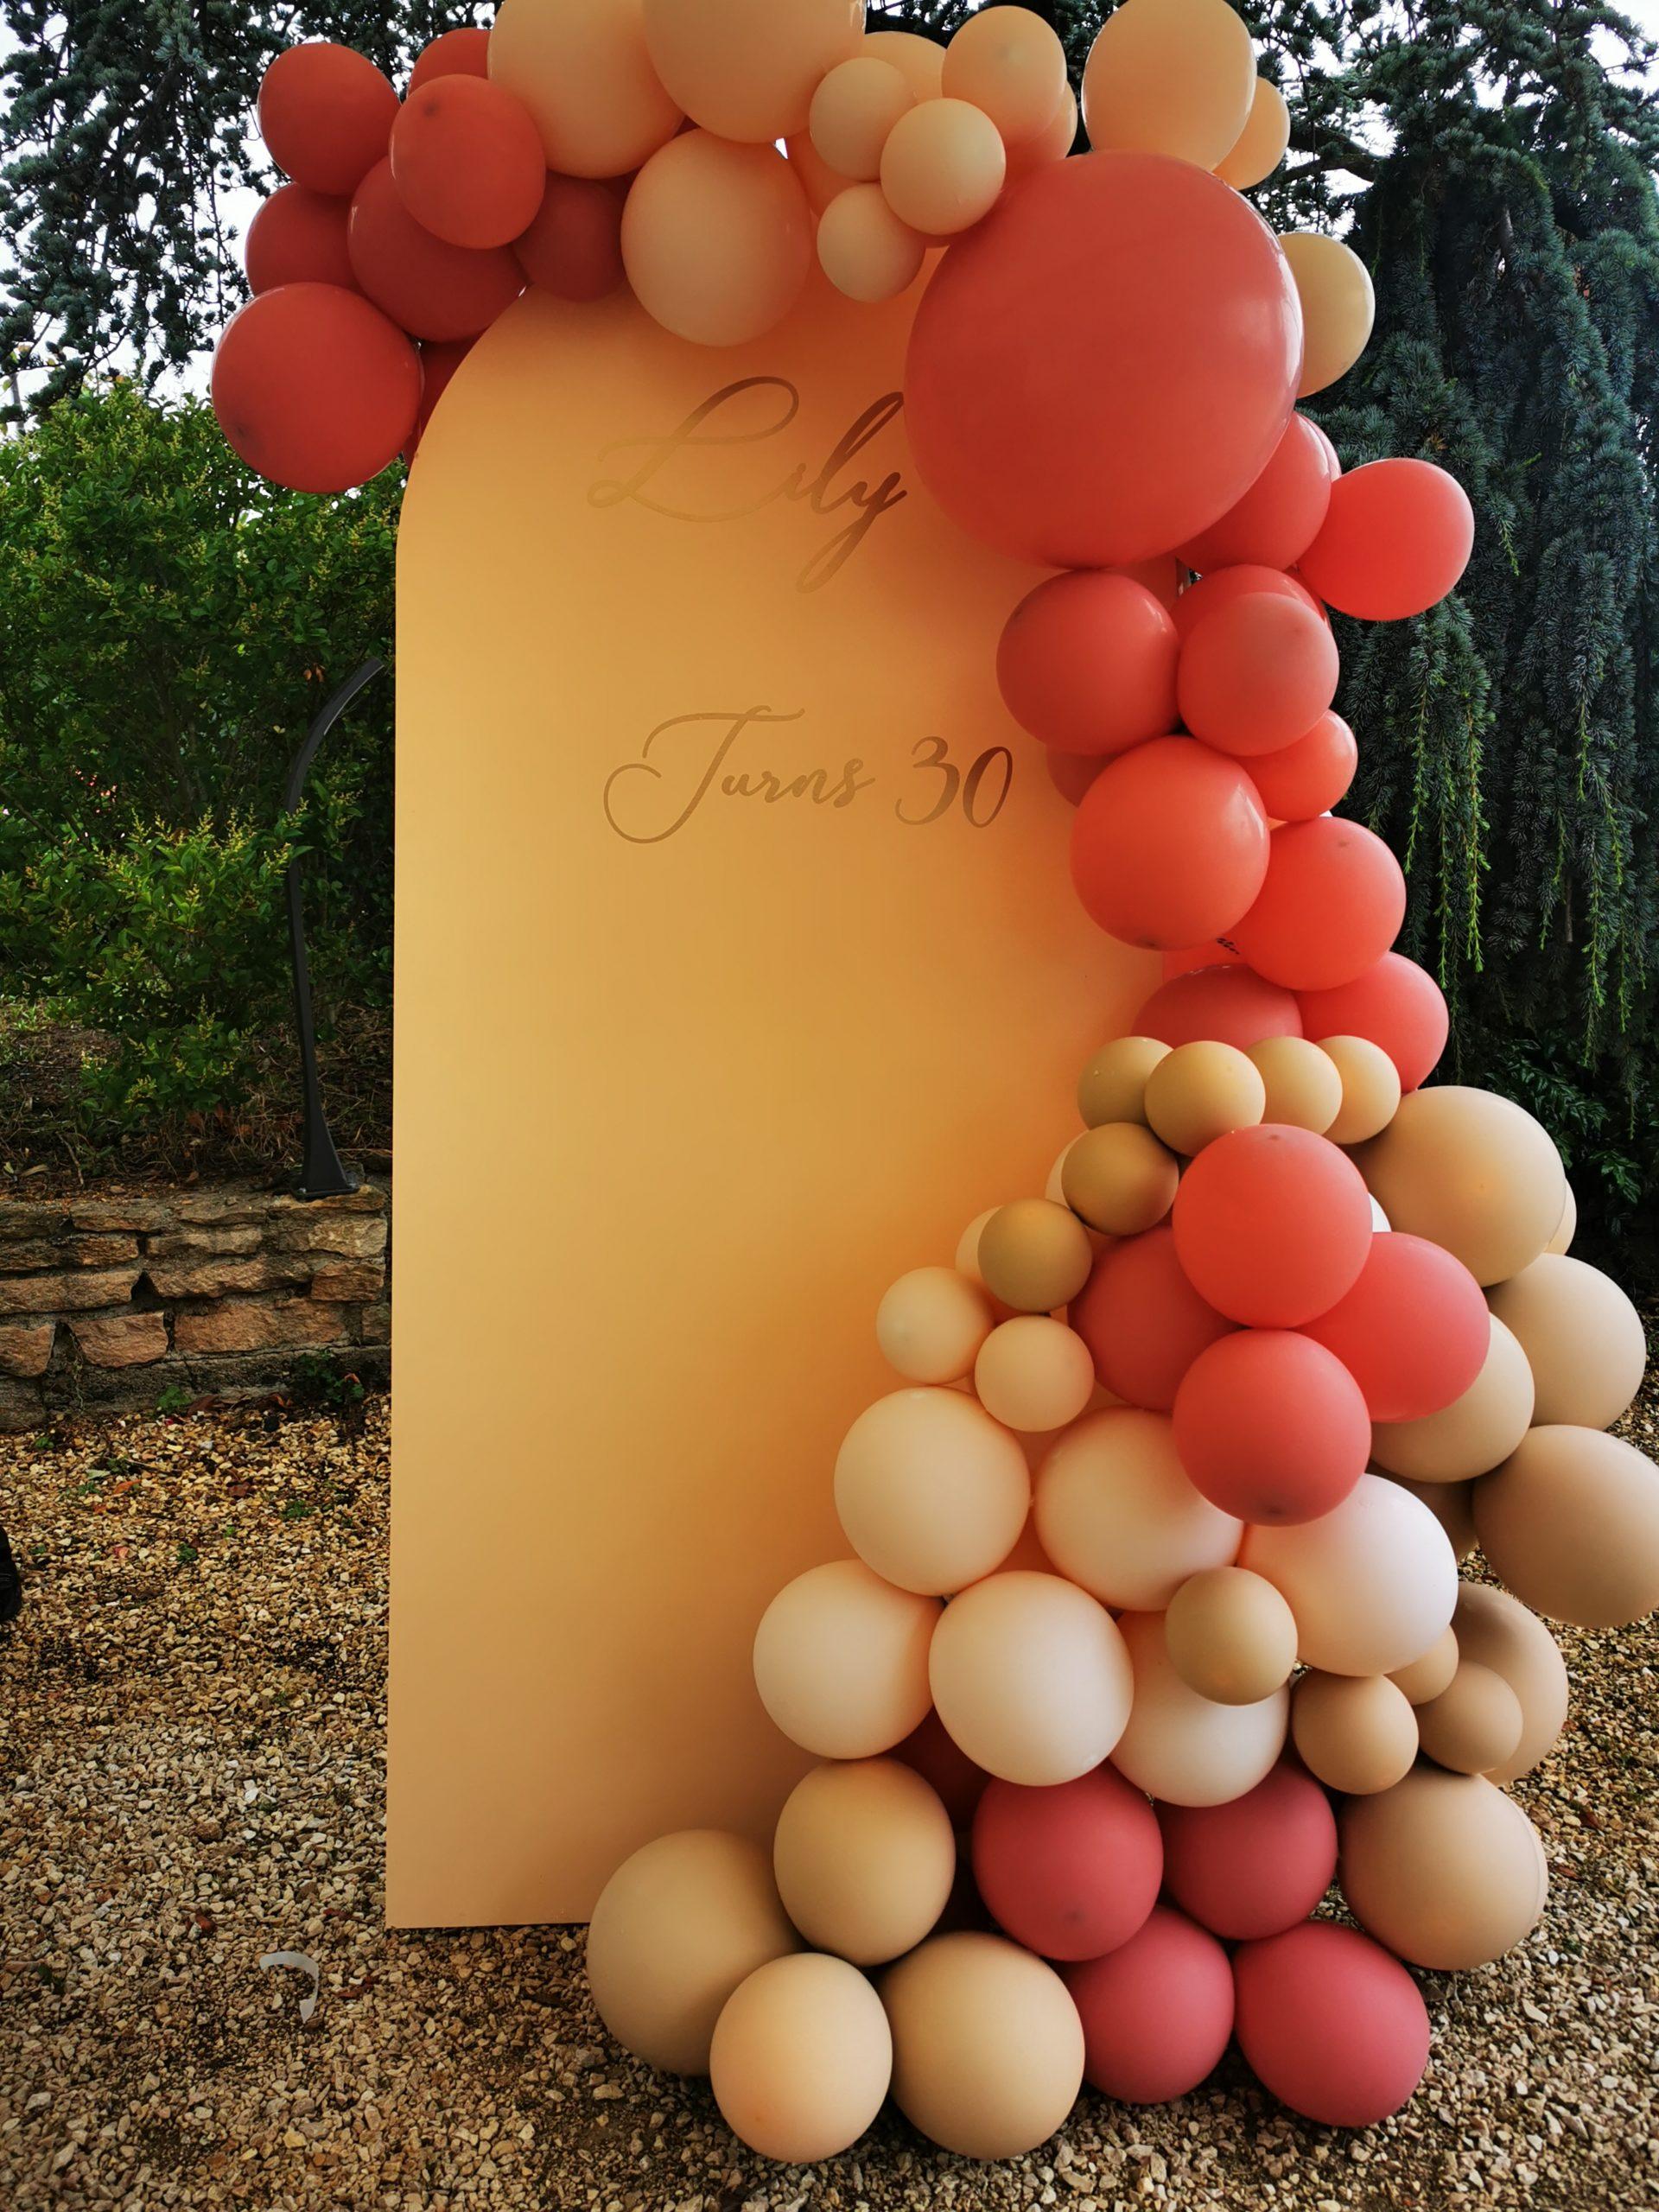 30 ans Lily - les moments m wedding planner lyon